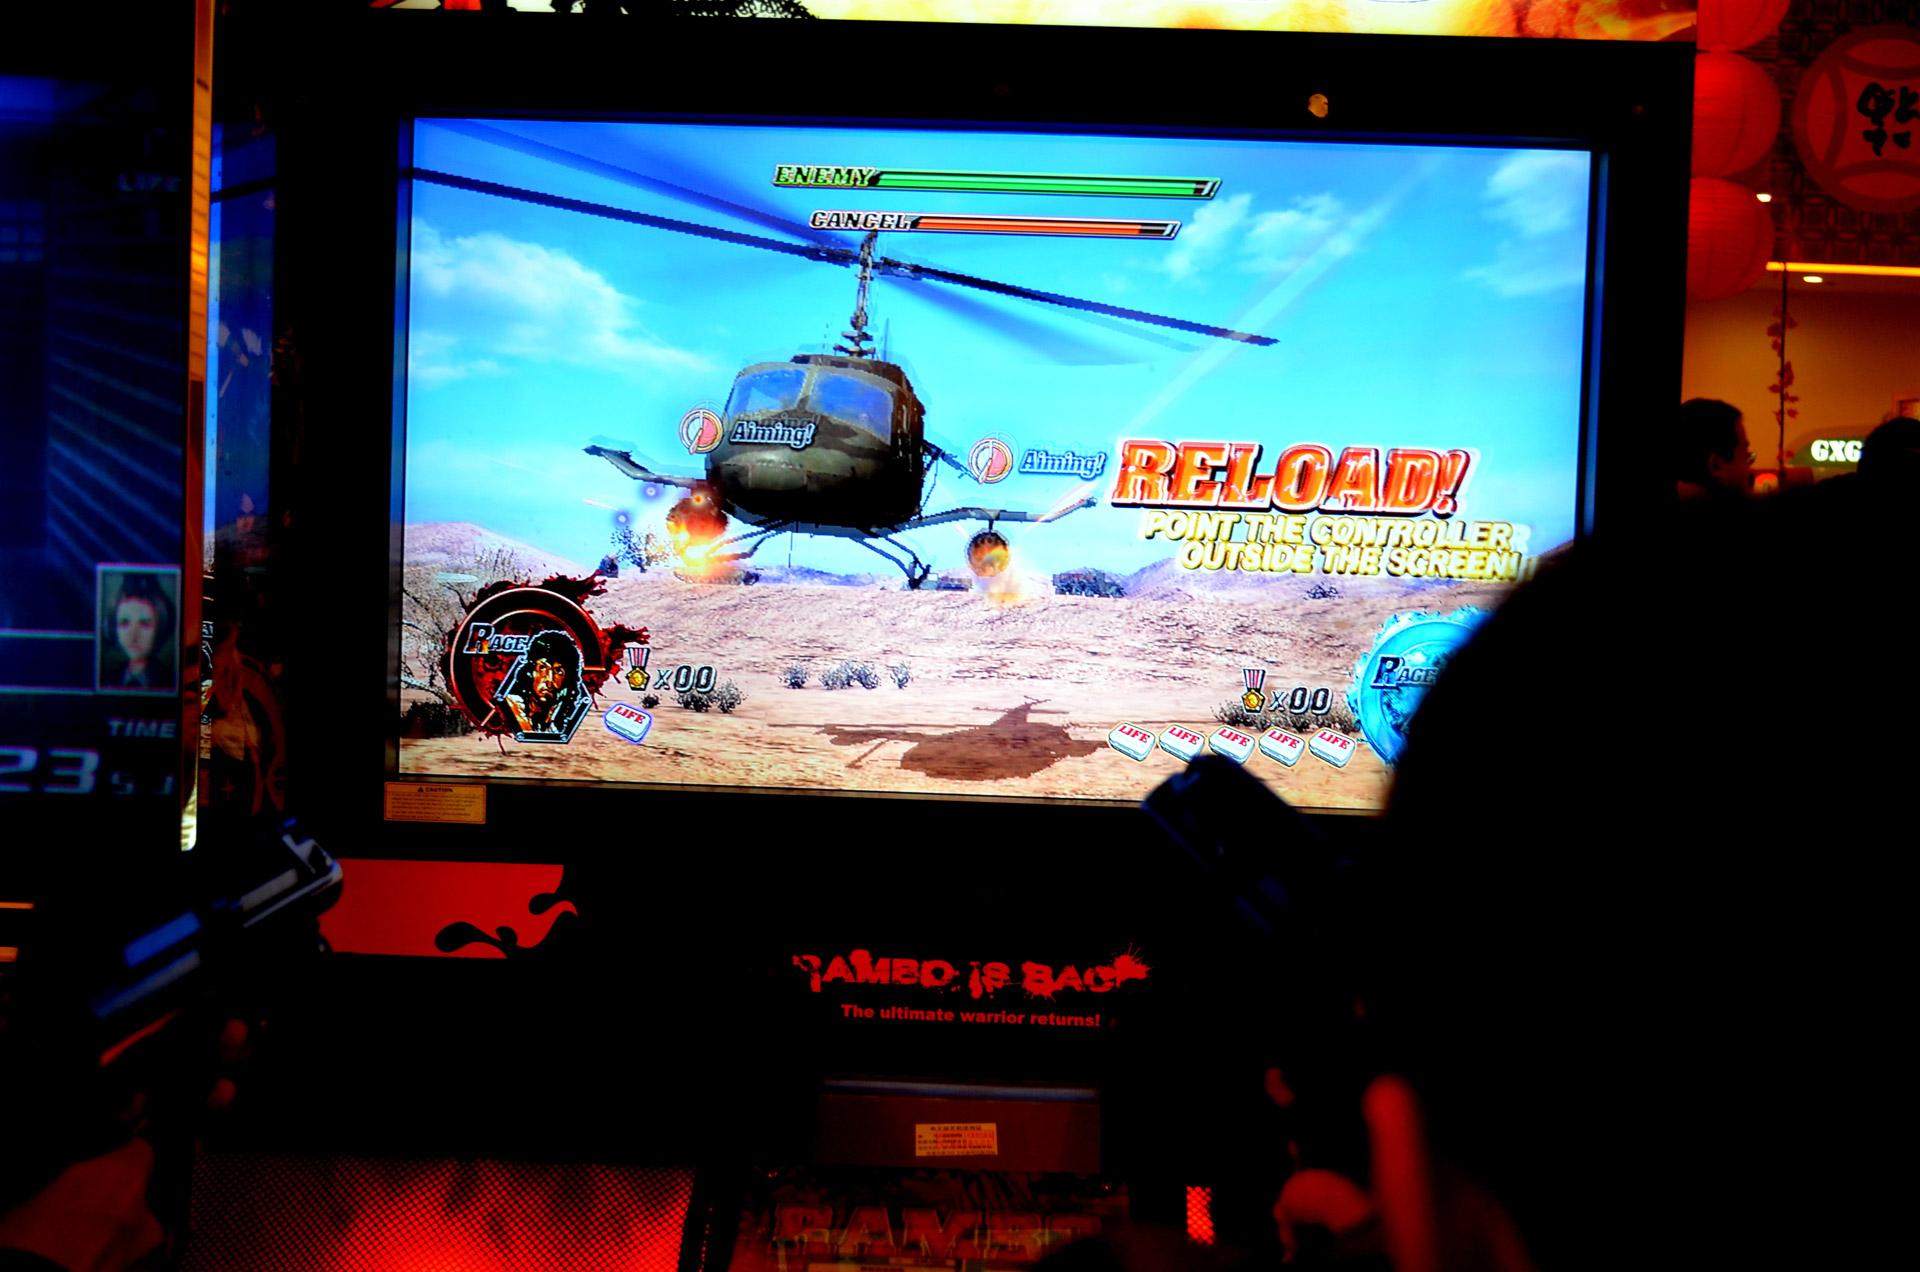 arcade-gaming-1361761483gDu.jpg